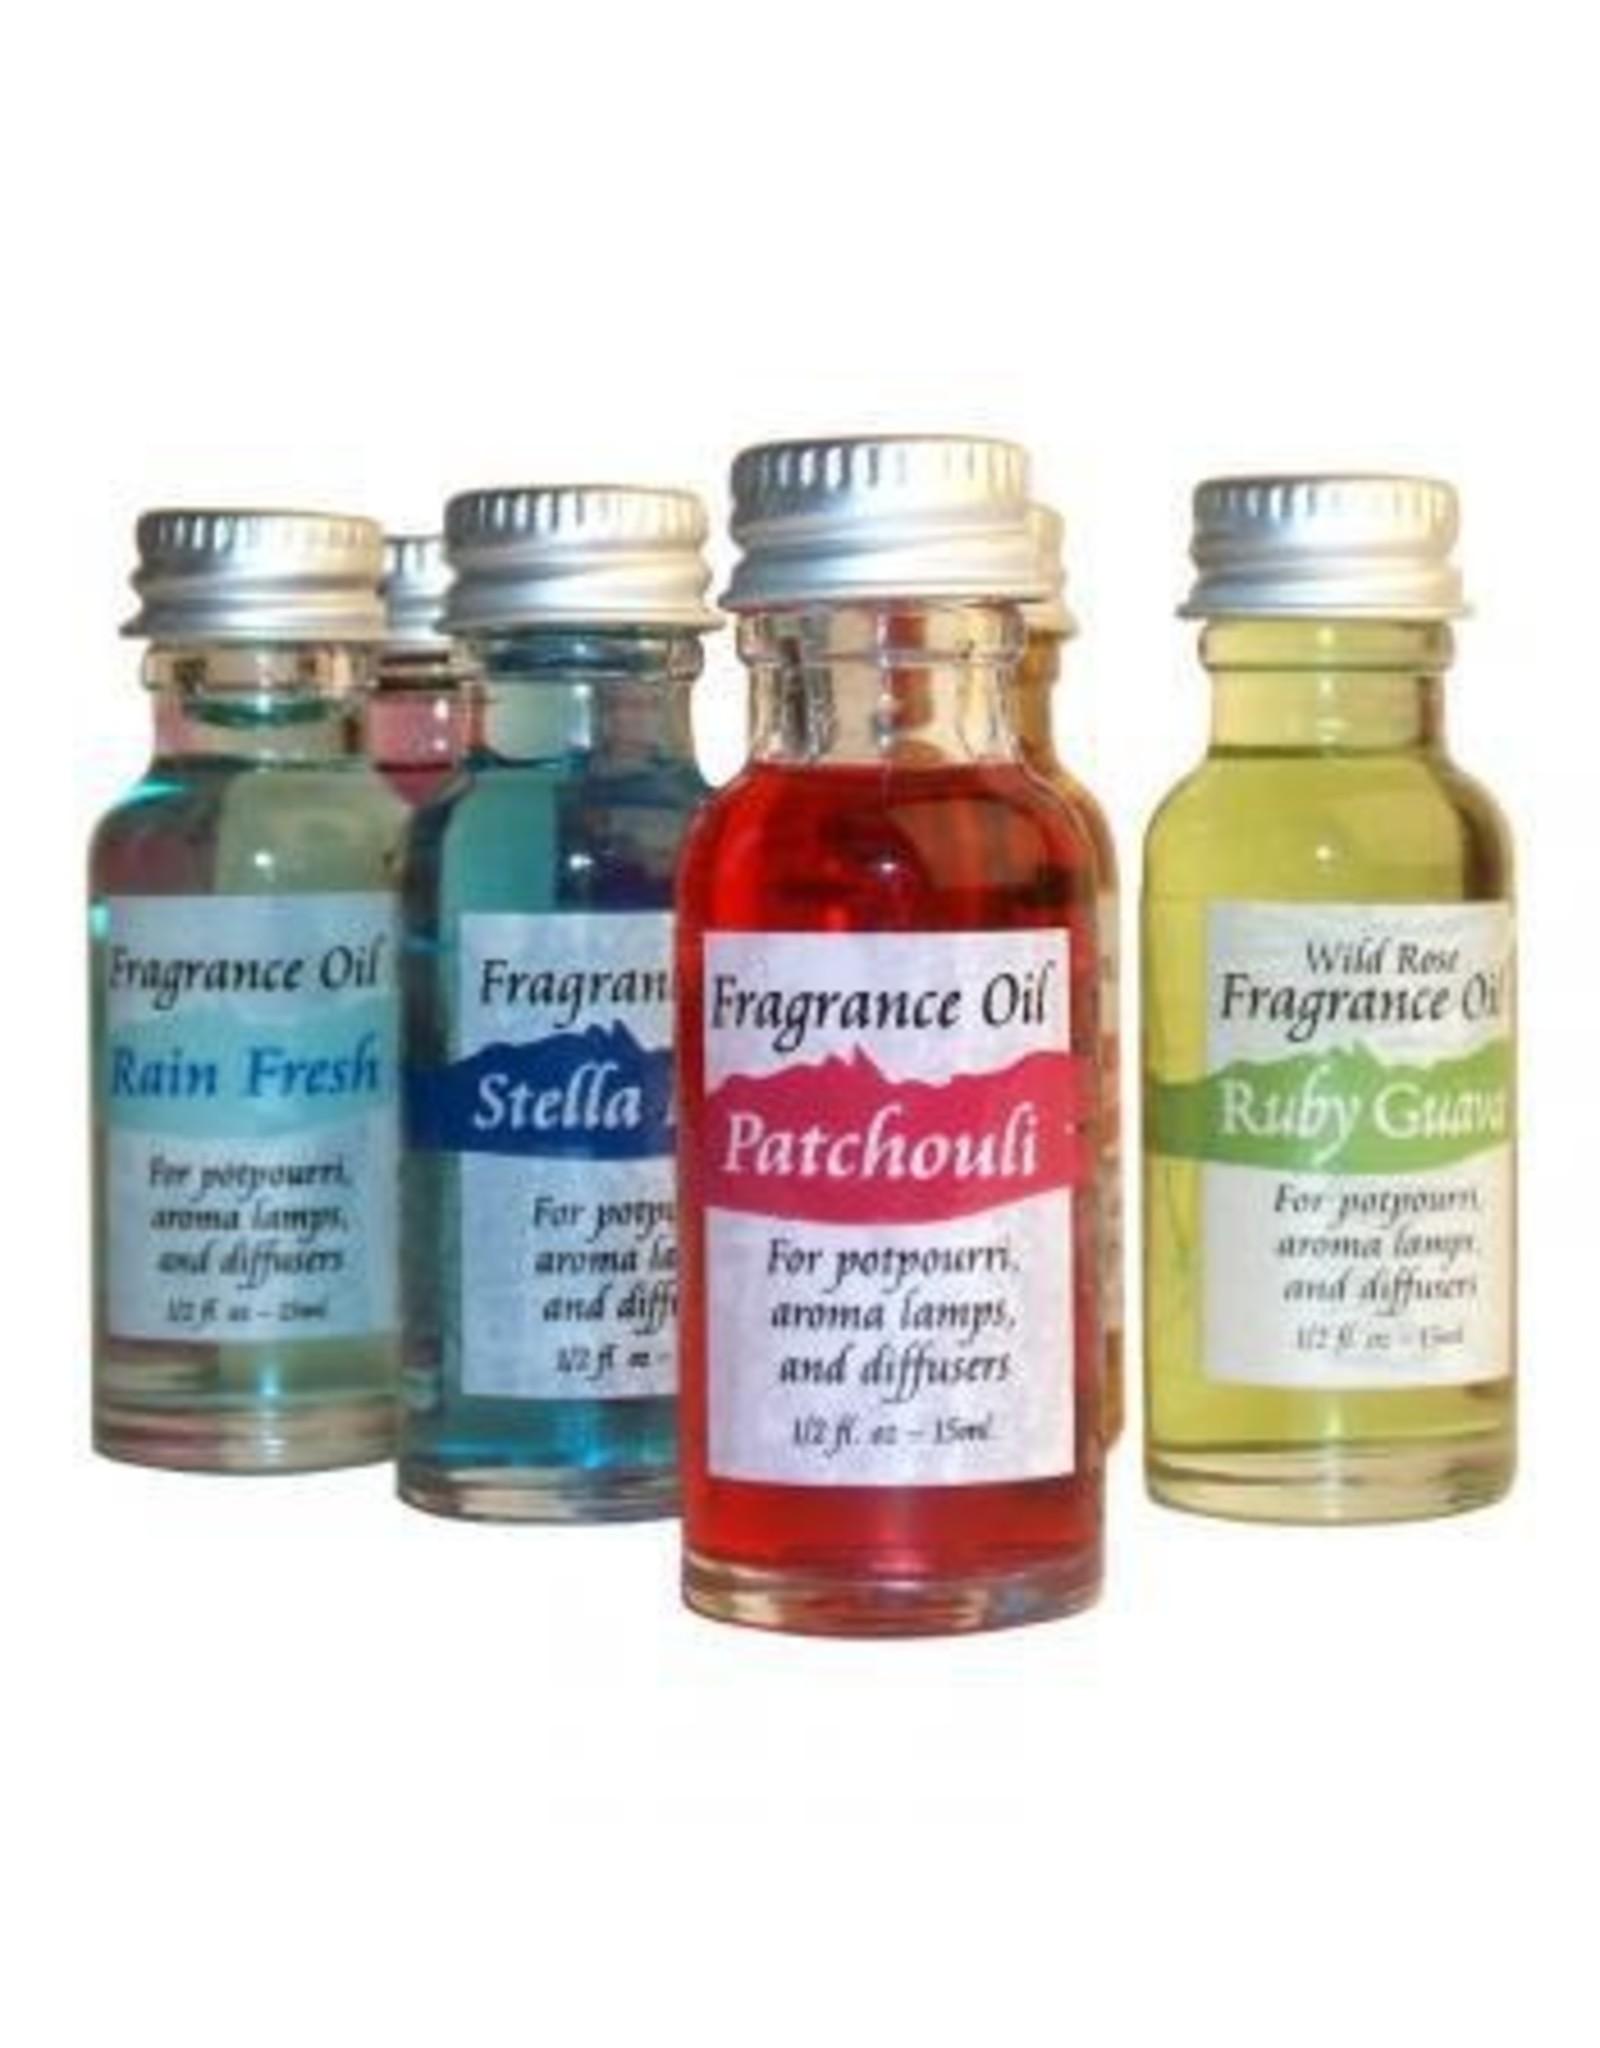 China Mist Fragrance Oil